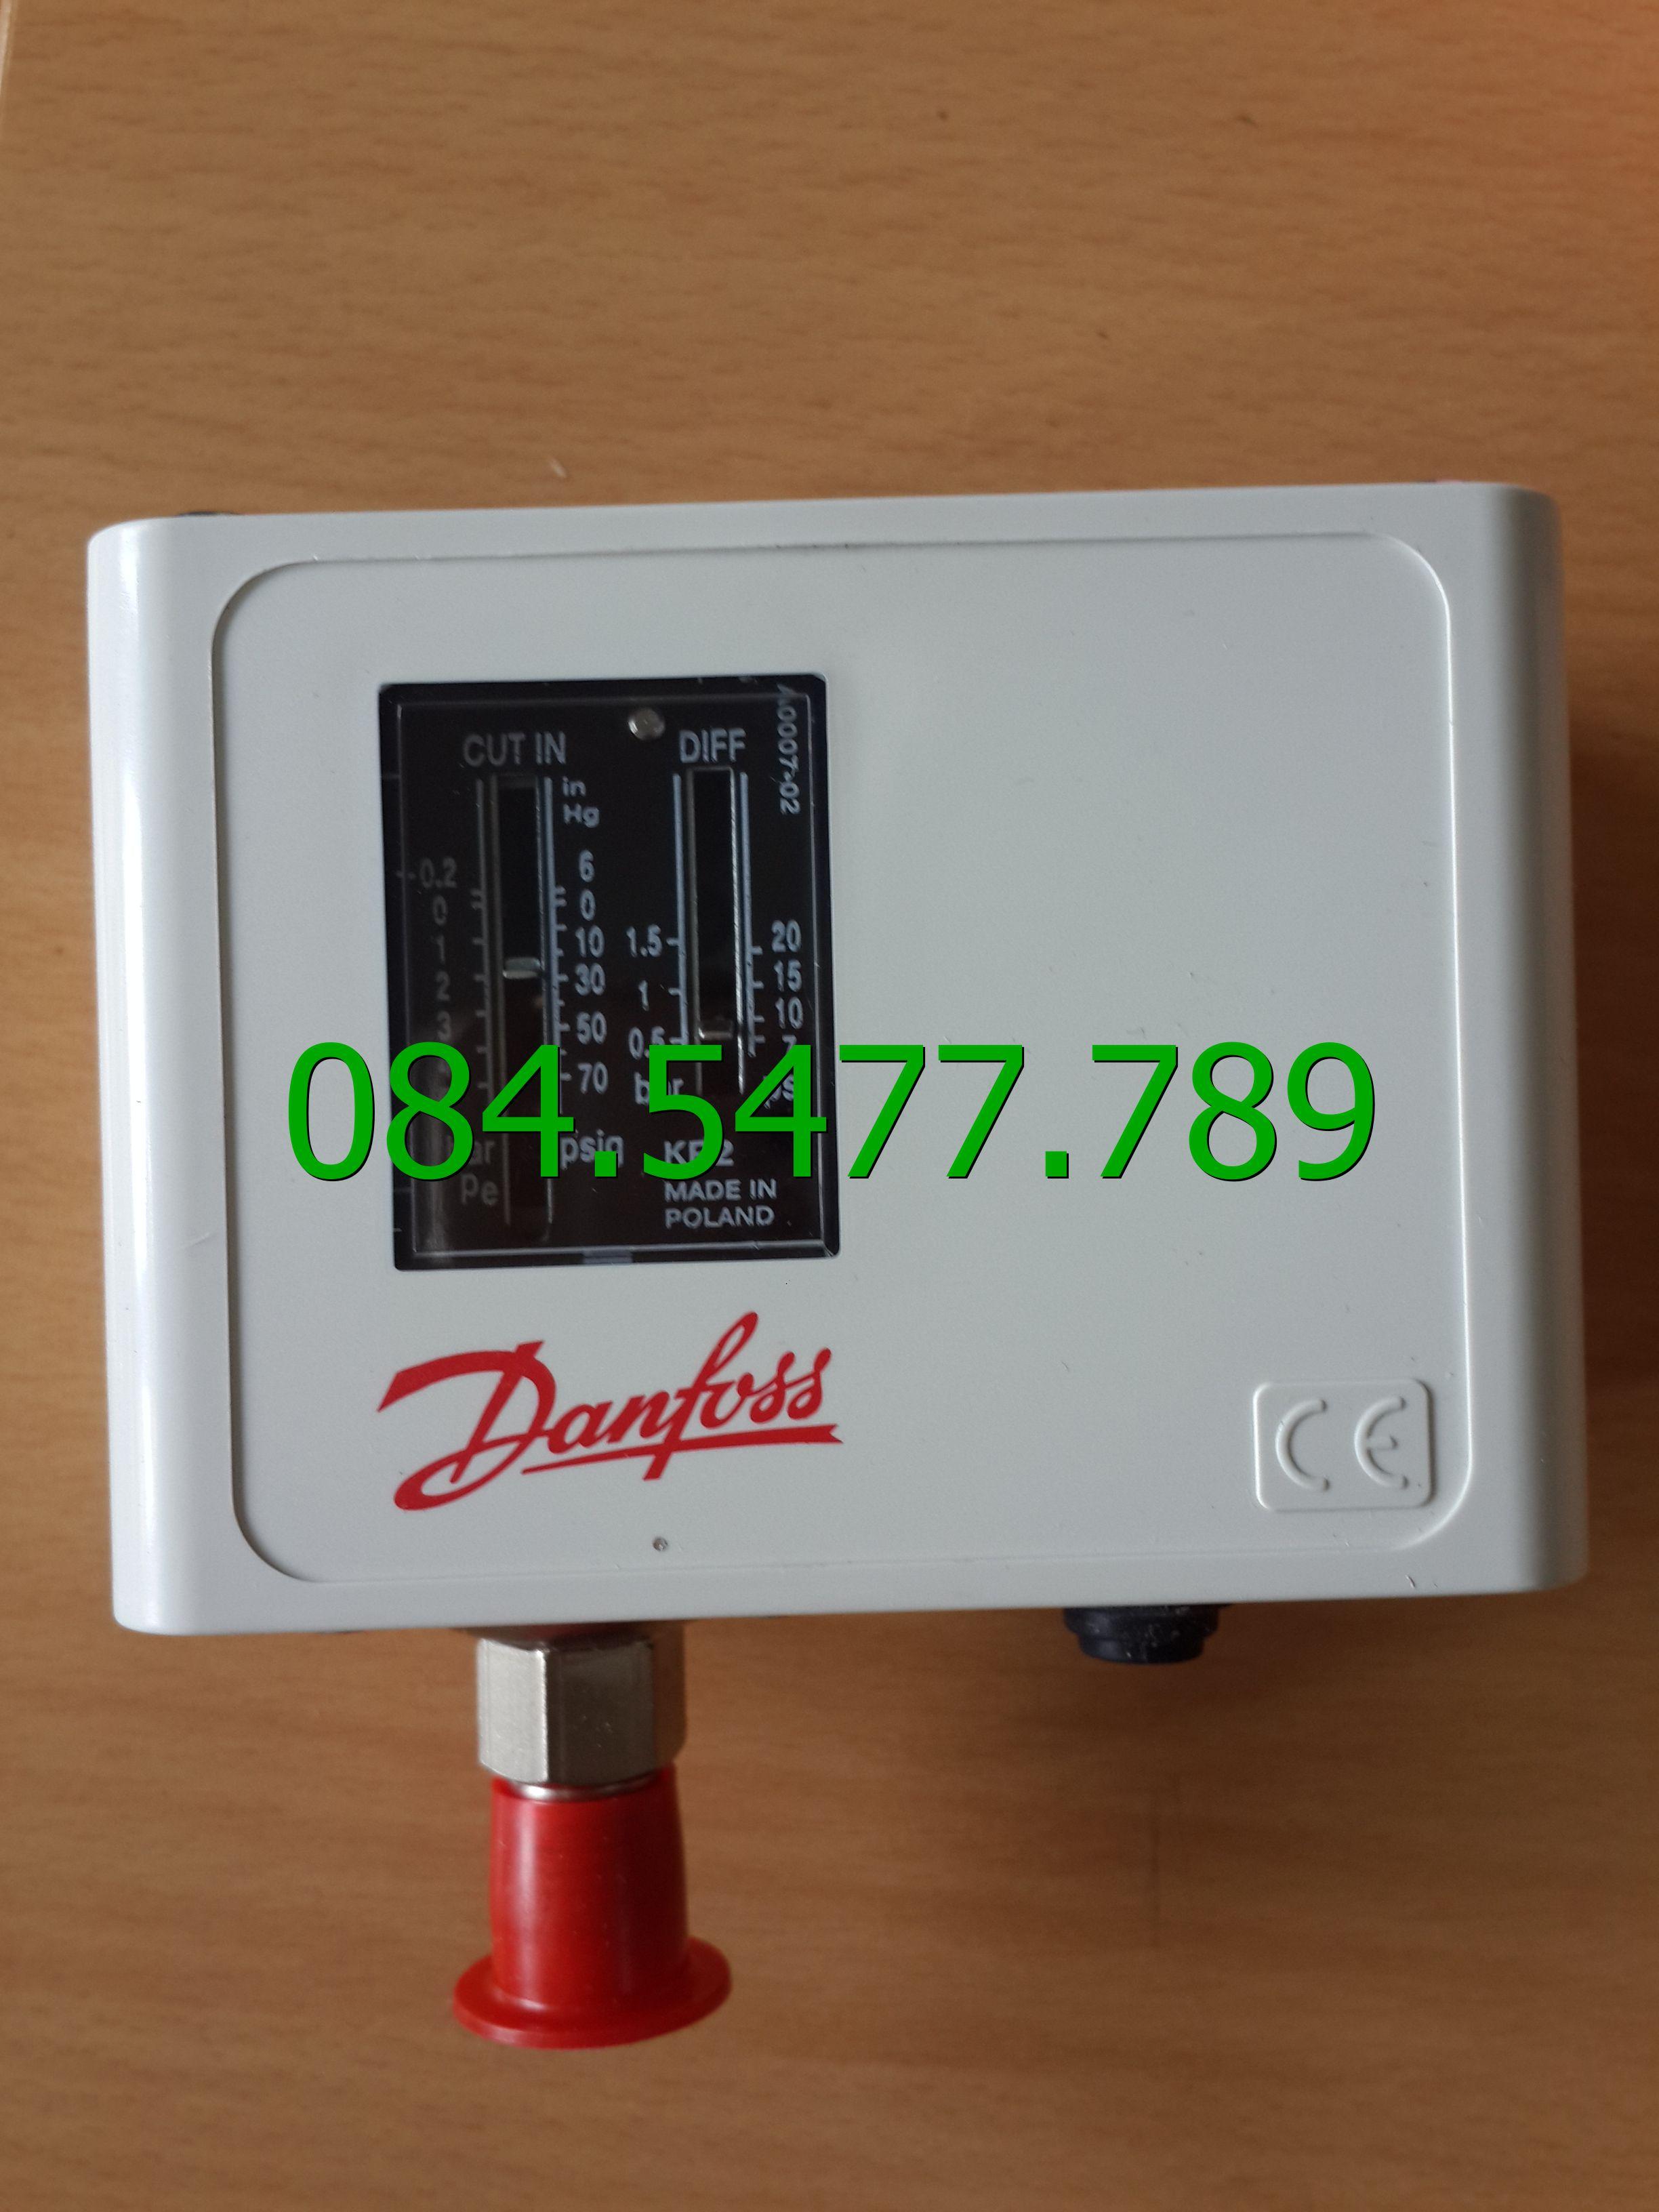 Thiết bị kiểm tra áp suất KP1 Danfoss